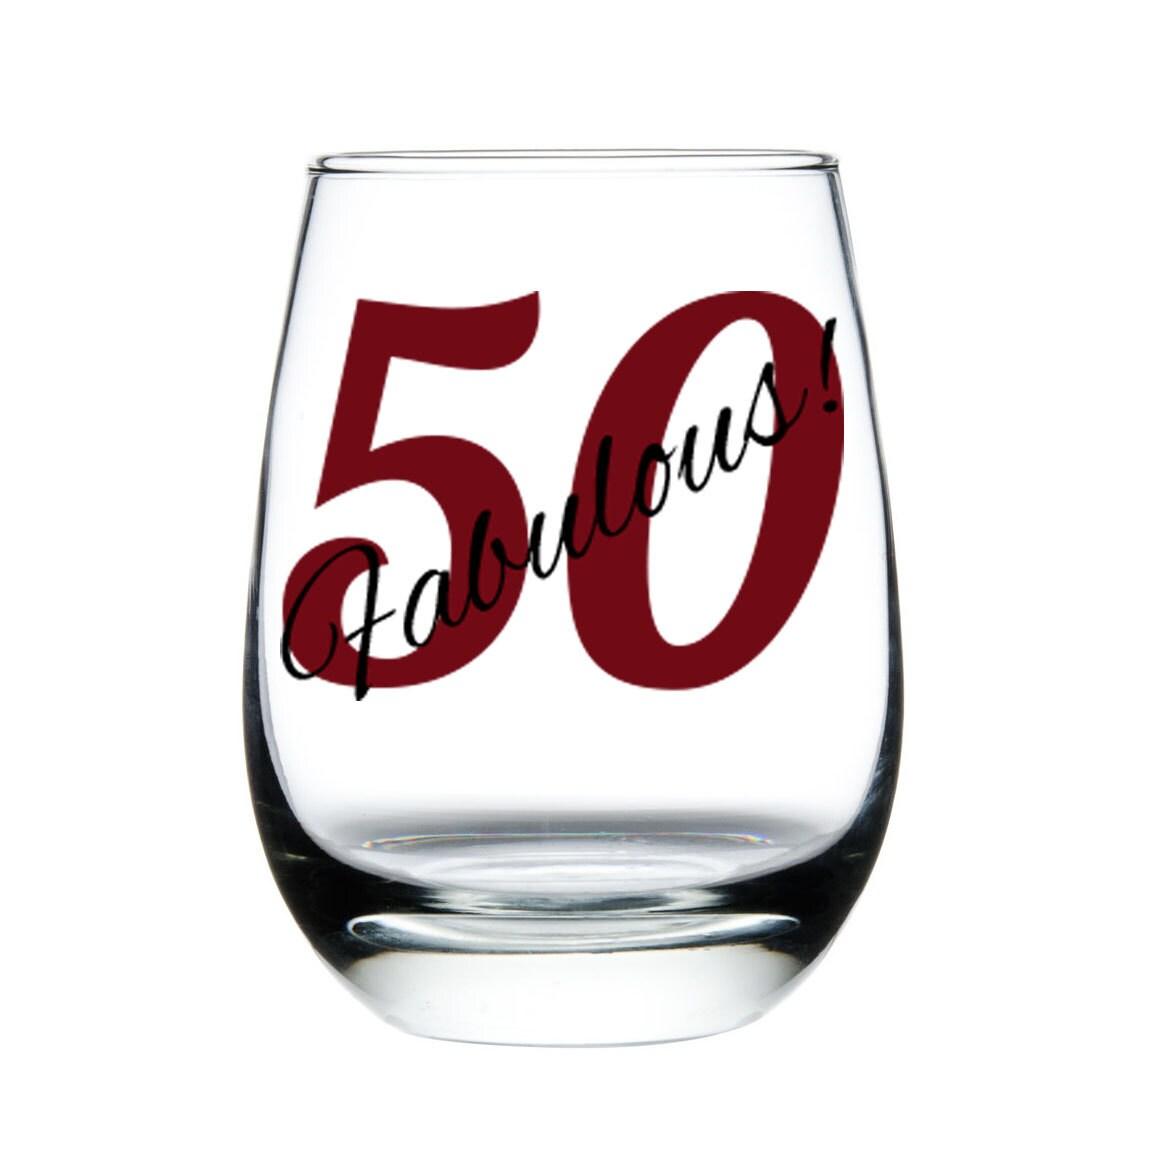 Fabulous 50 Wine Glass50th Birthday Wine Glass By Madoliveshop